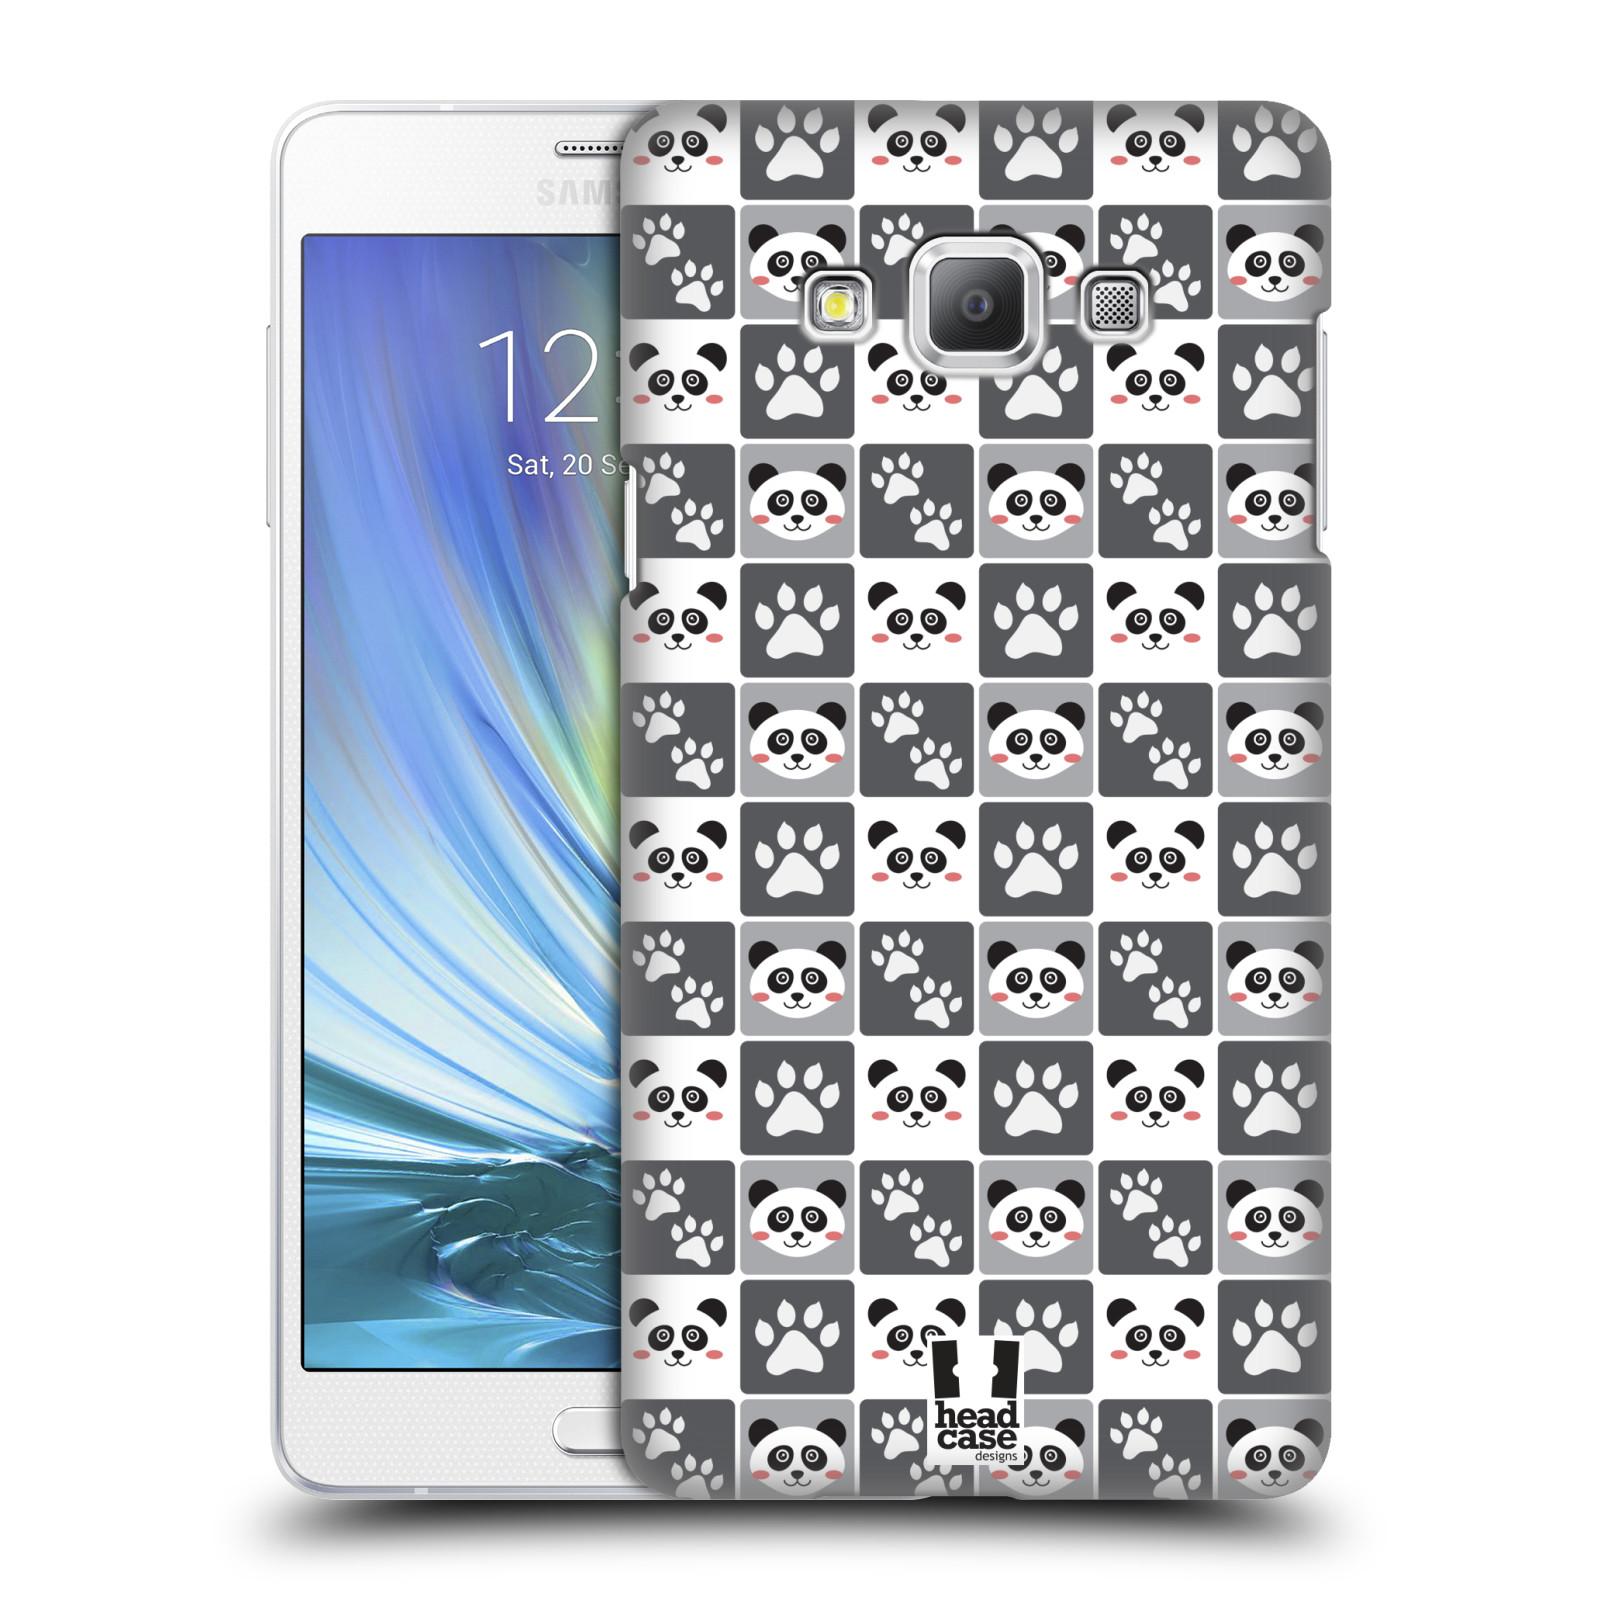 HEAD CASE plastový obal na mobil SAMSUNG GALAXY A7 vzor Zvířecí razítka MEDVÍDEK PANDA